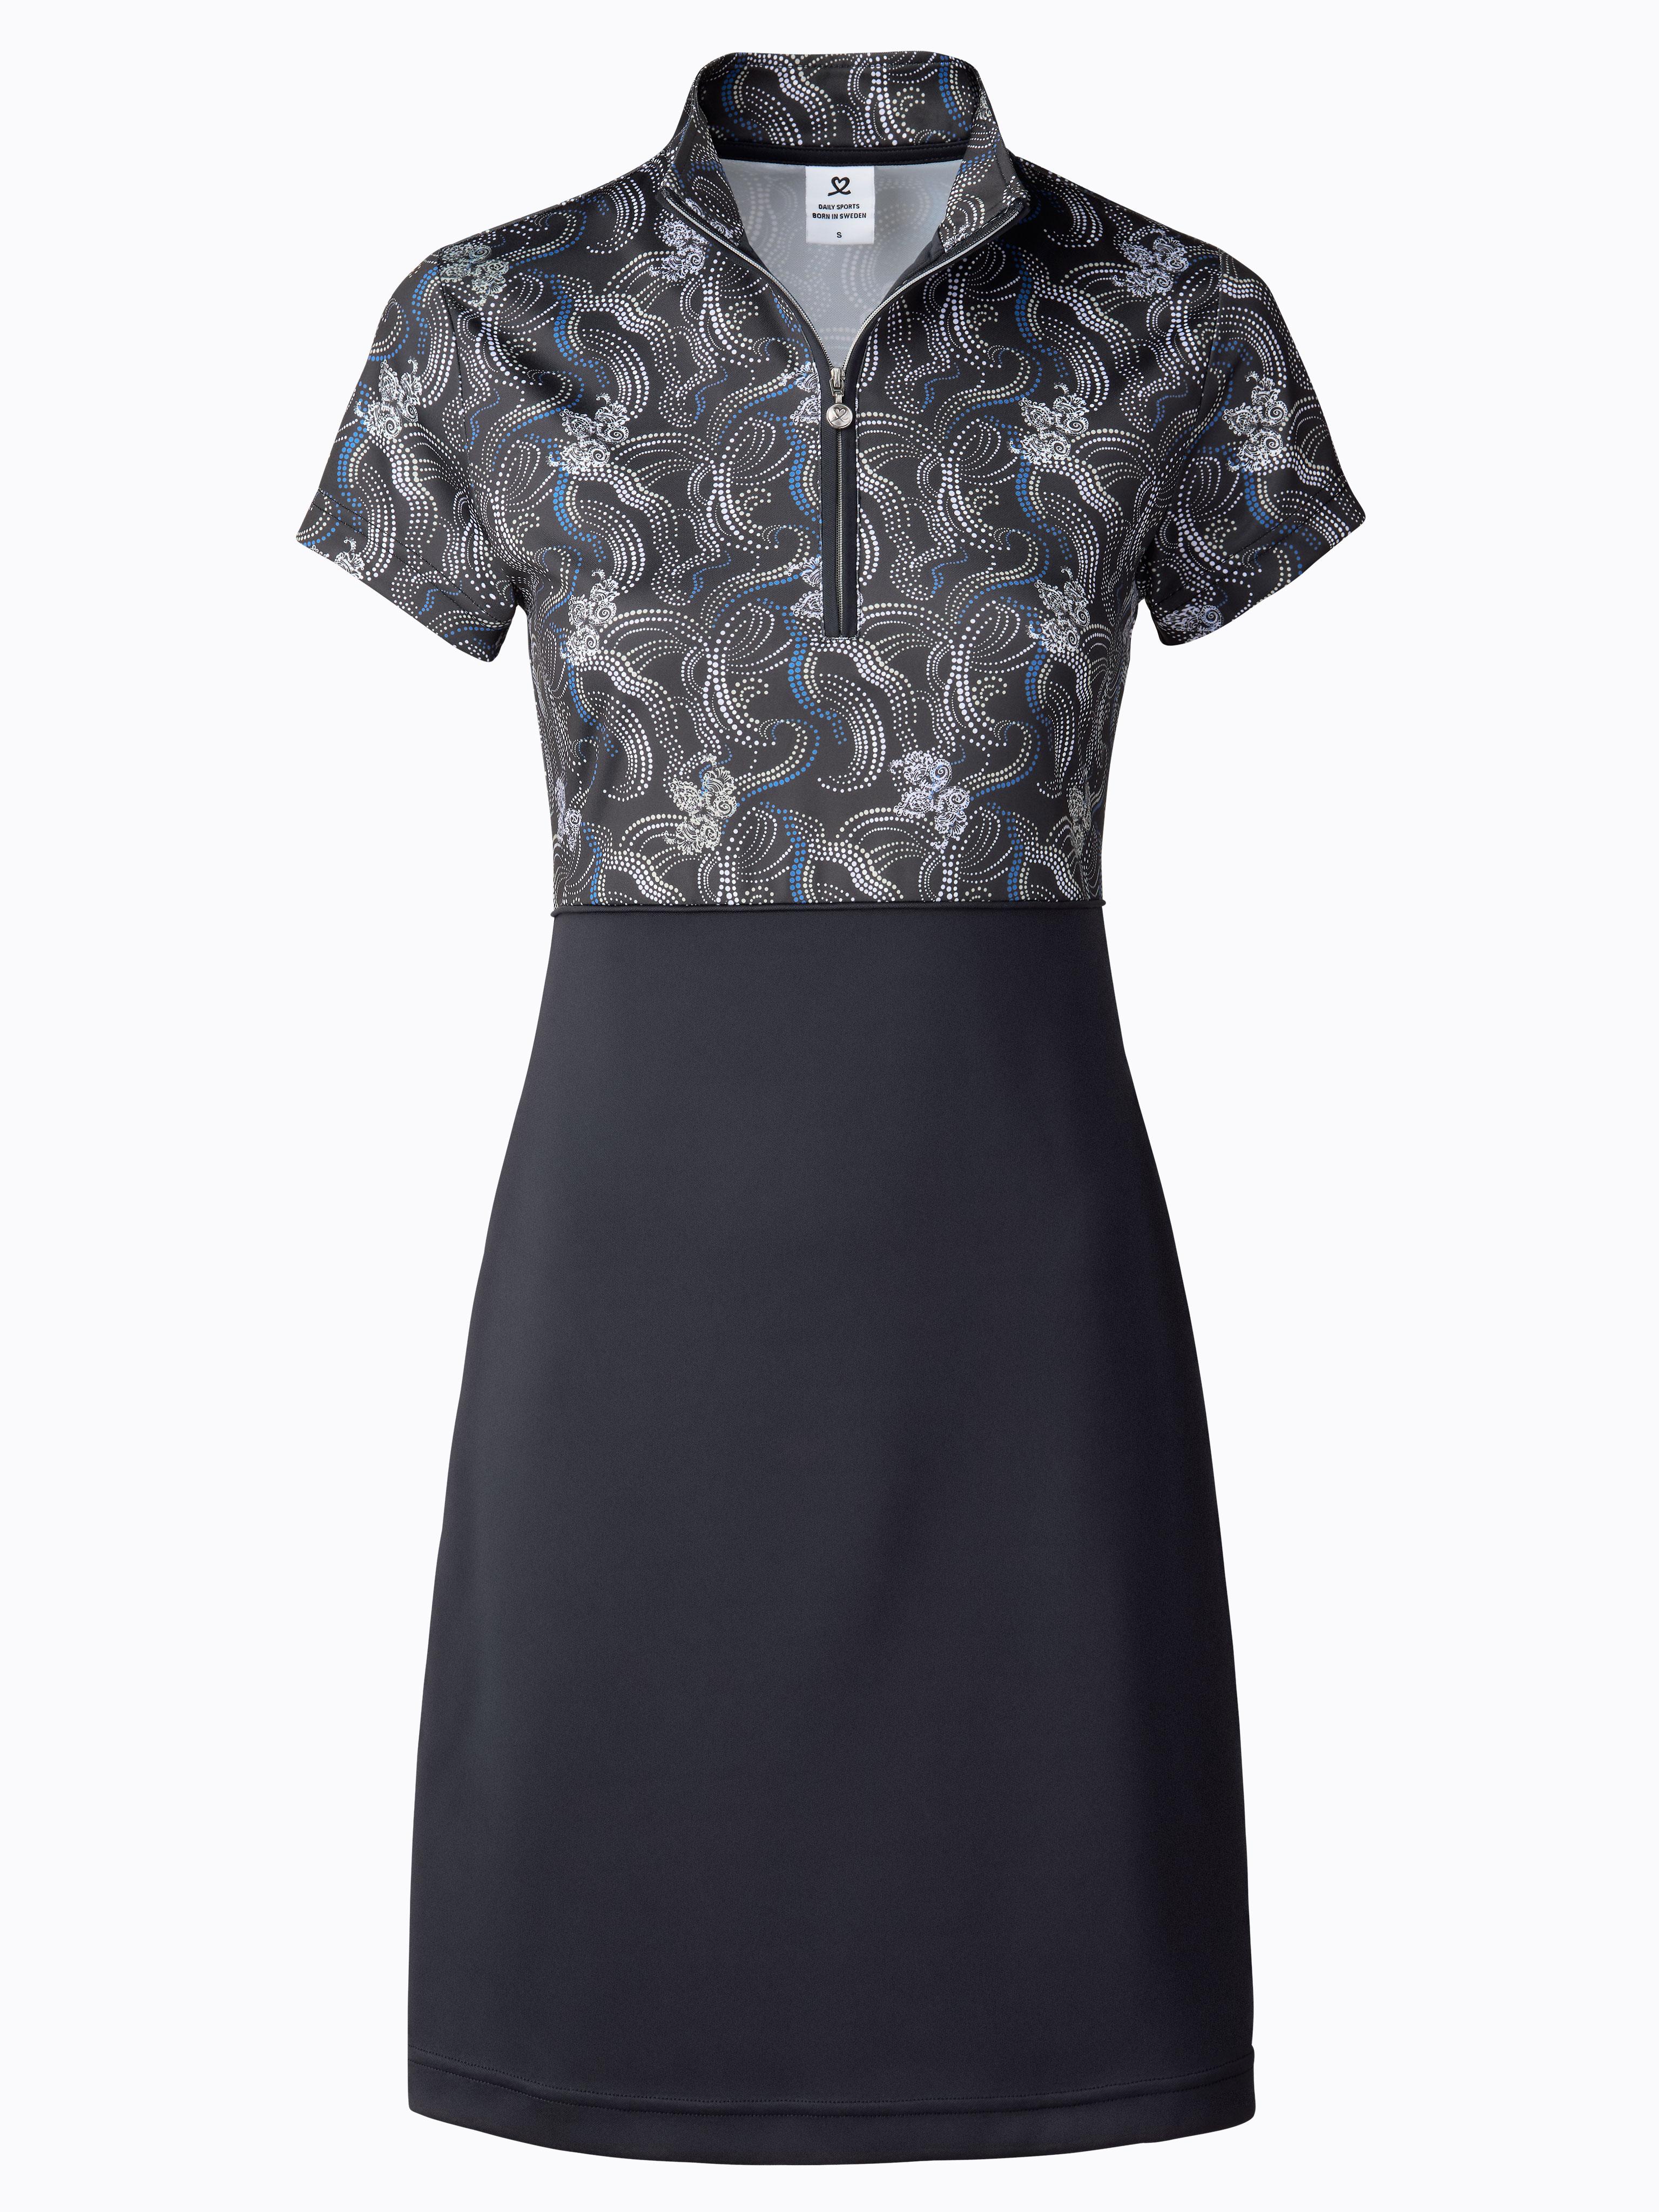 Luisa Cap Short-sleeved Dress